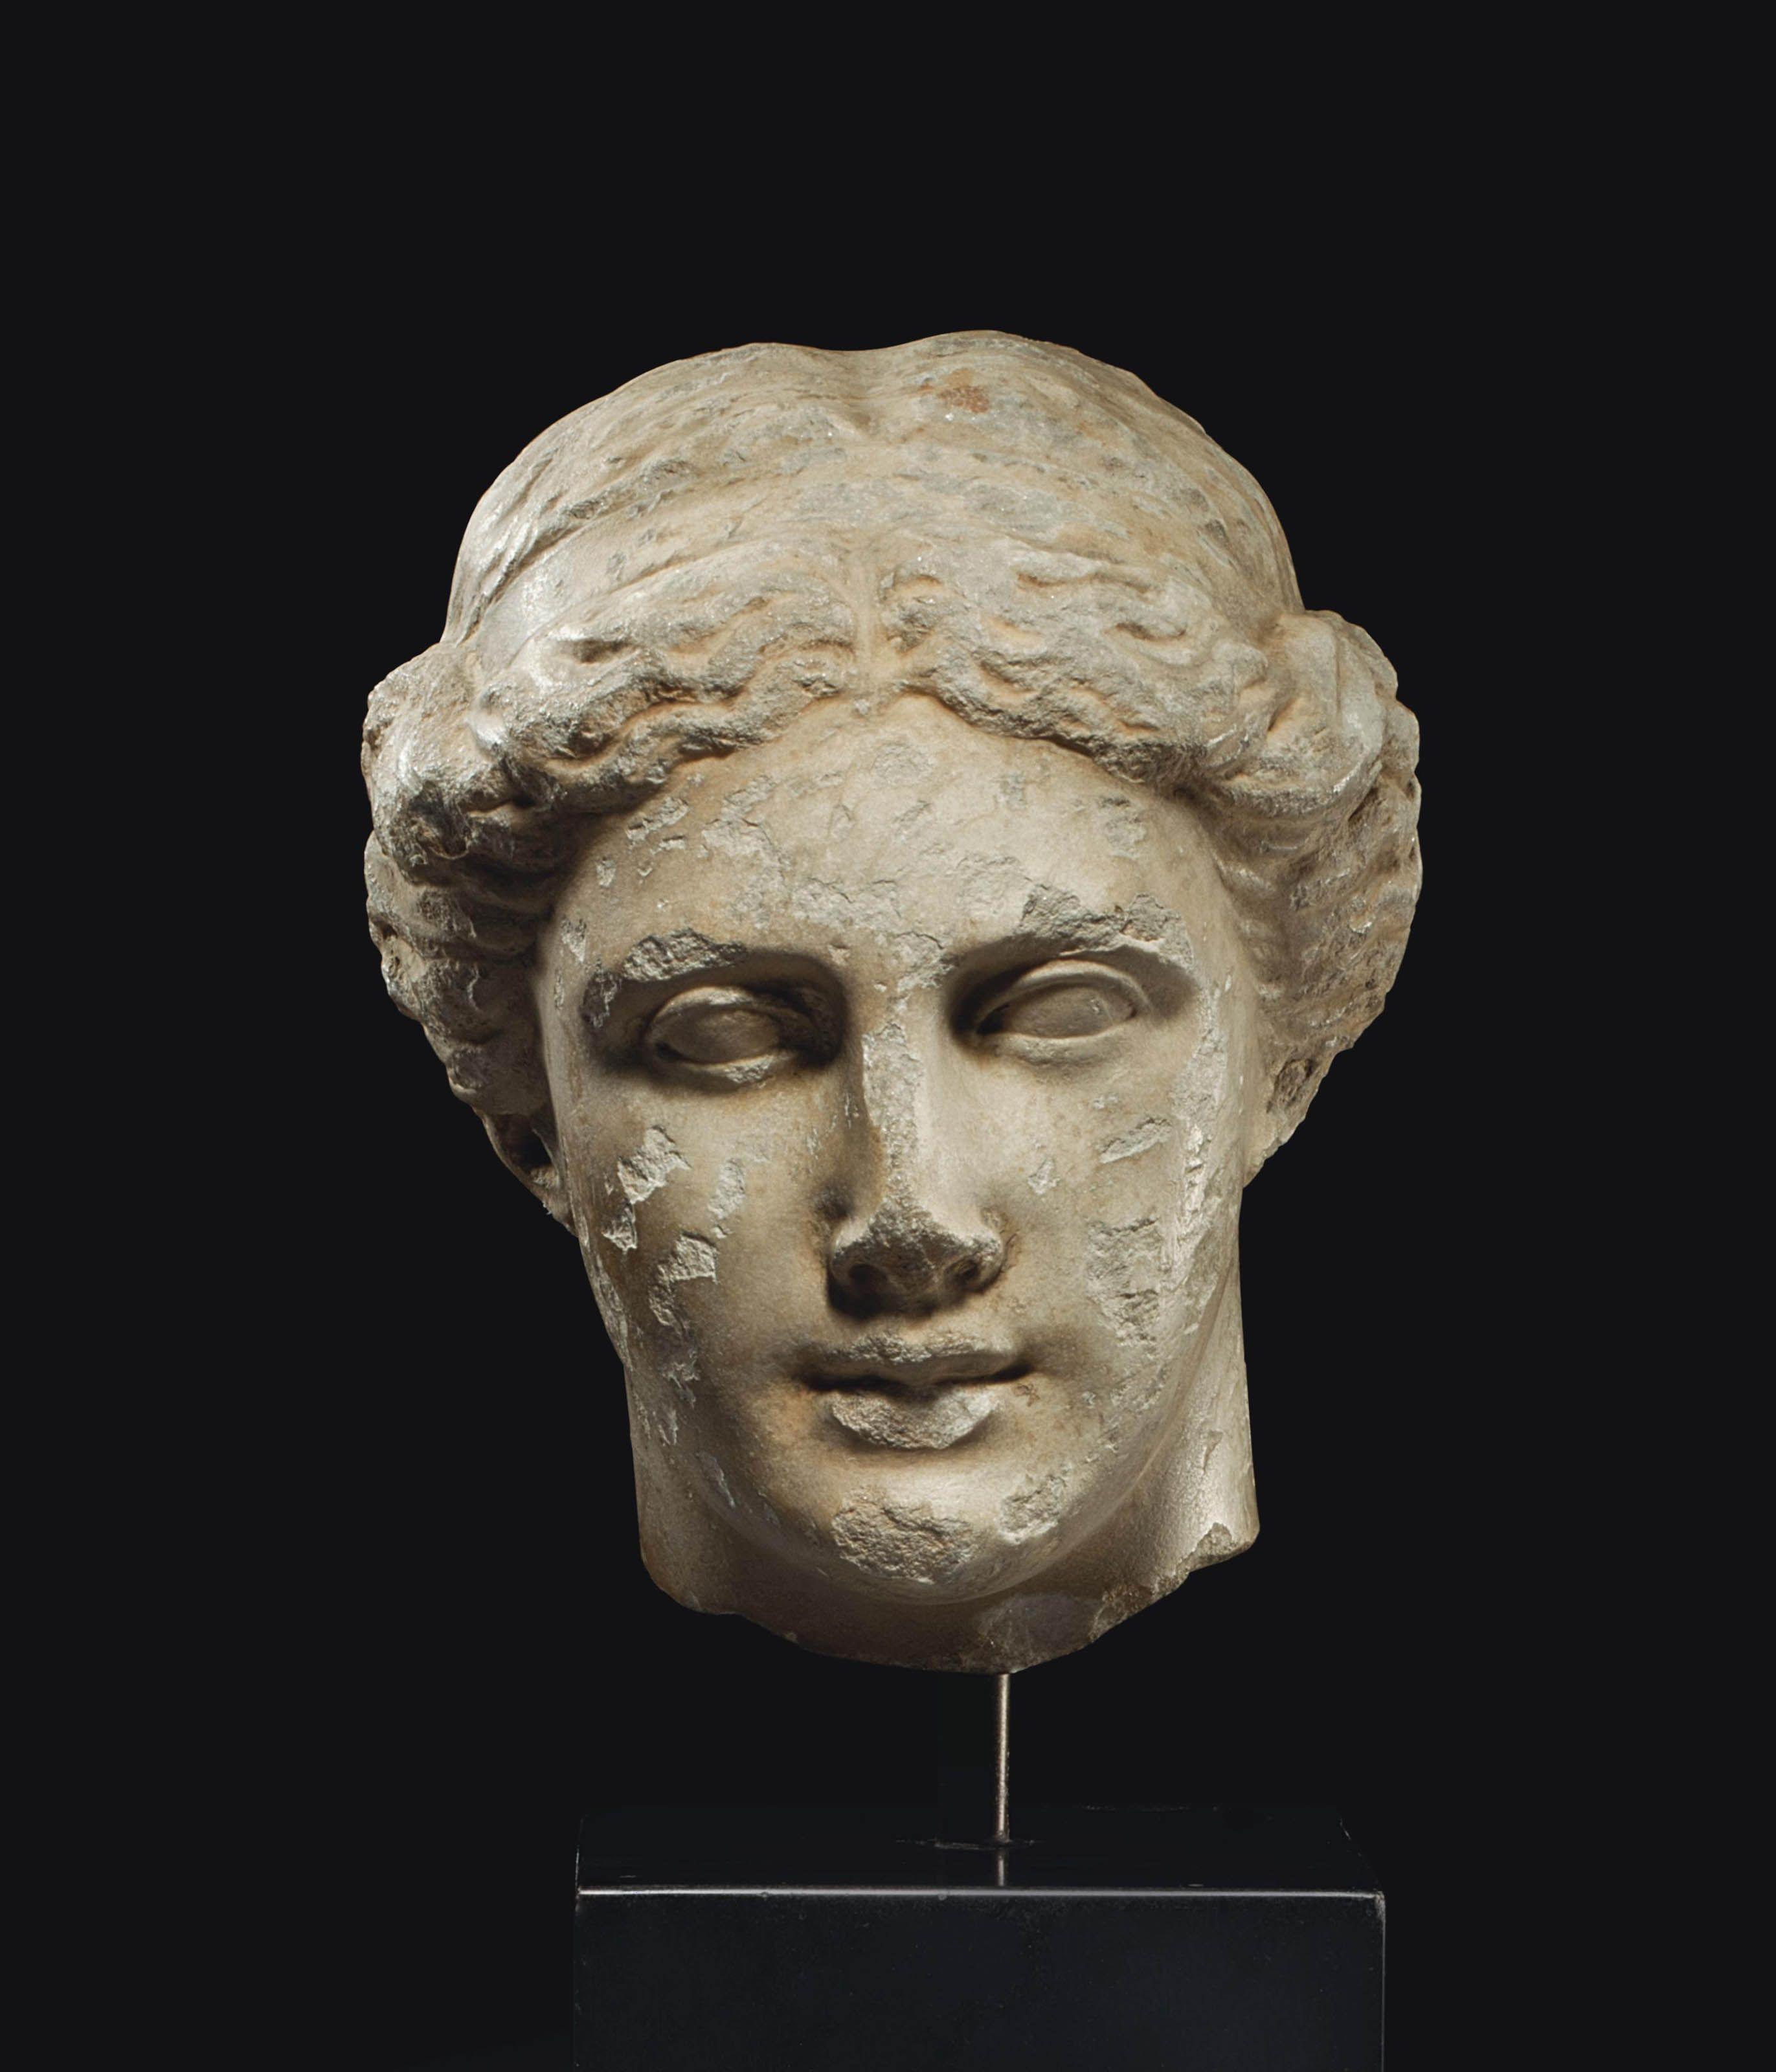 Greek Marble Head Of A Goddess Classical Period Circa Late 5th Early 4th Century B C Greek Statues Roman Sculpture Goddess Sculpture